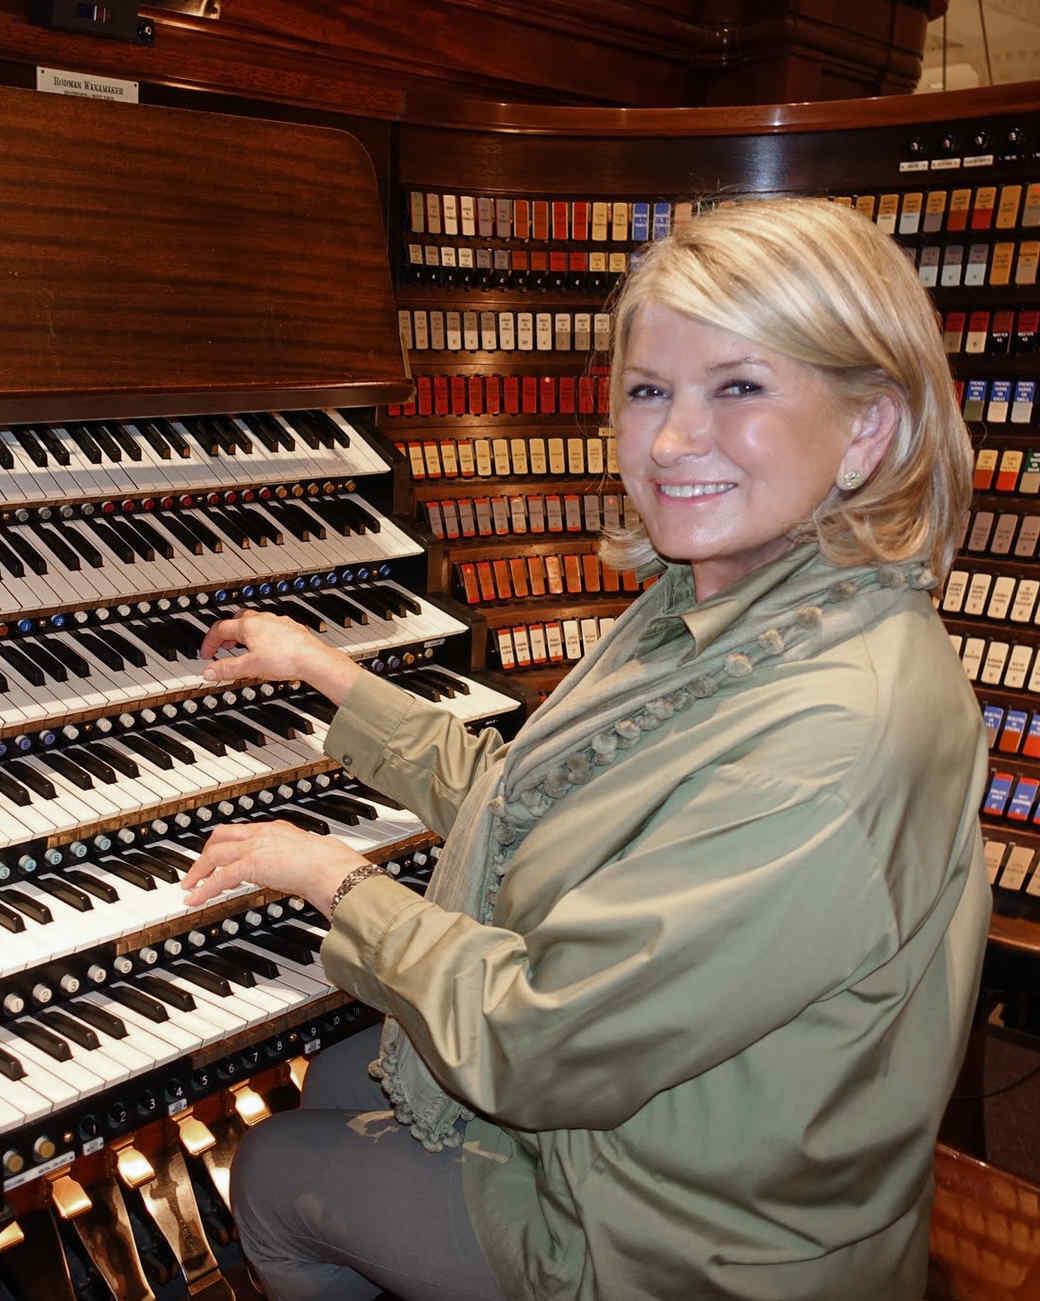 philly-book-signing-organ-24.jpg